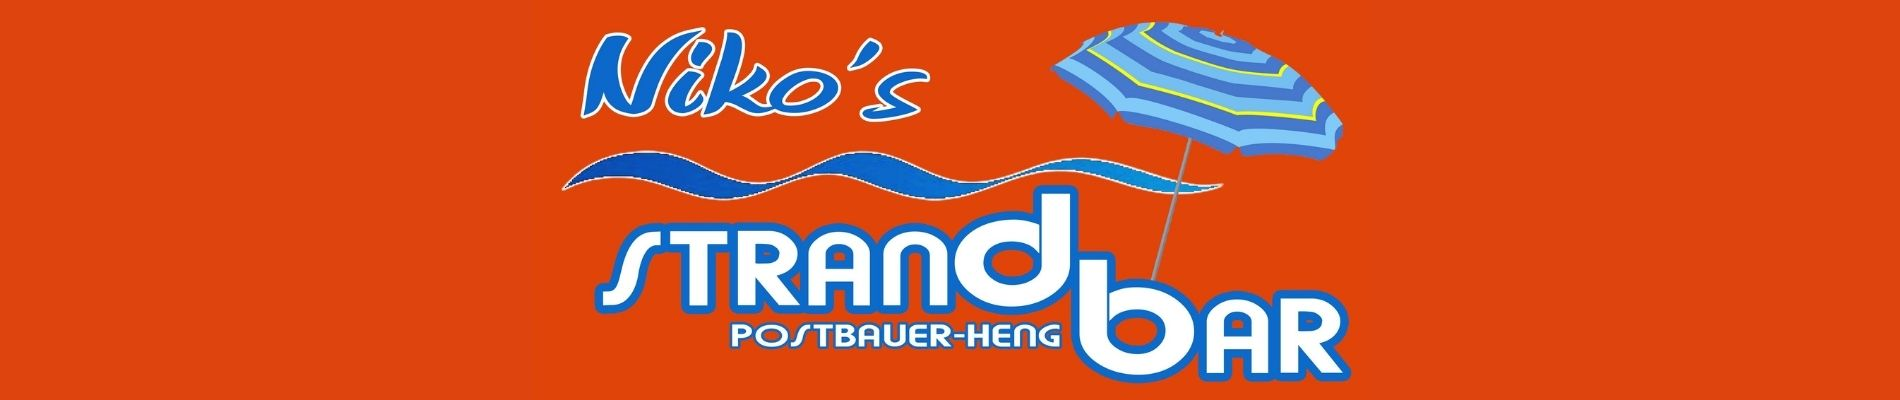 Restaurant Neumarkt Nikos Strandbar Postbauer-Heng Teaser Mobil